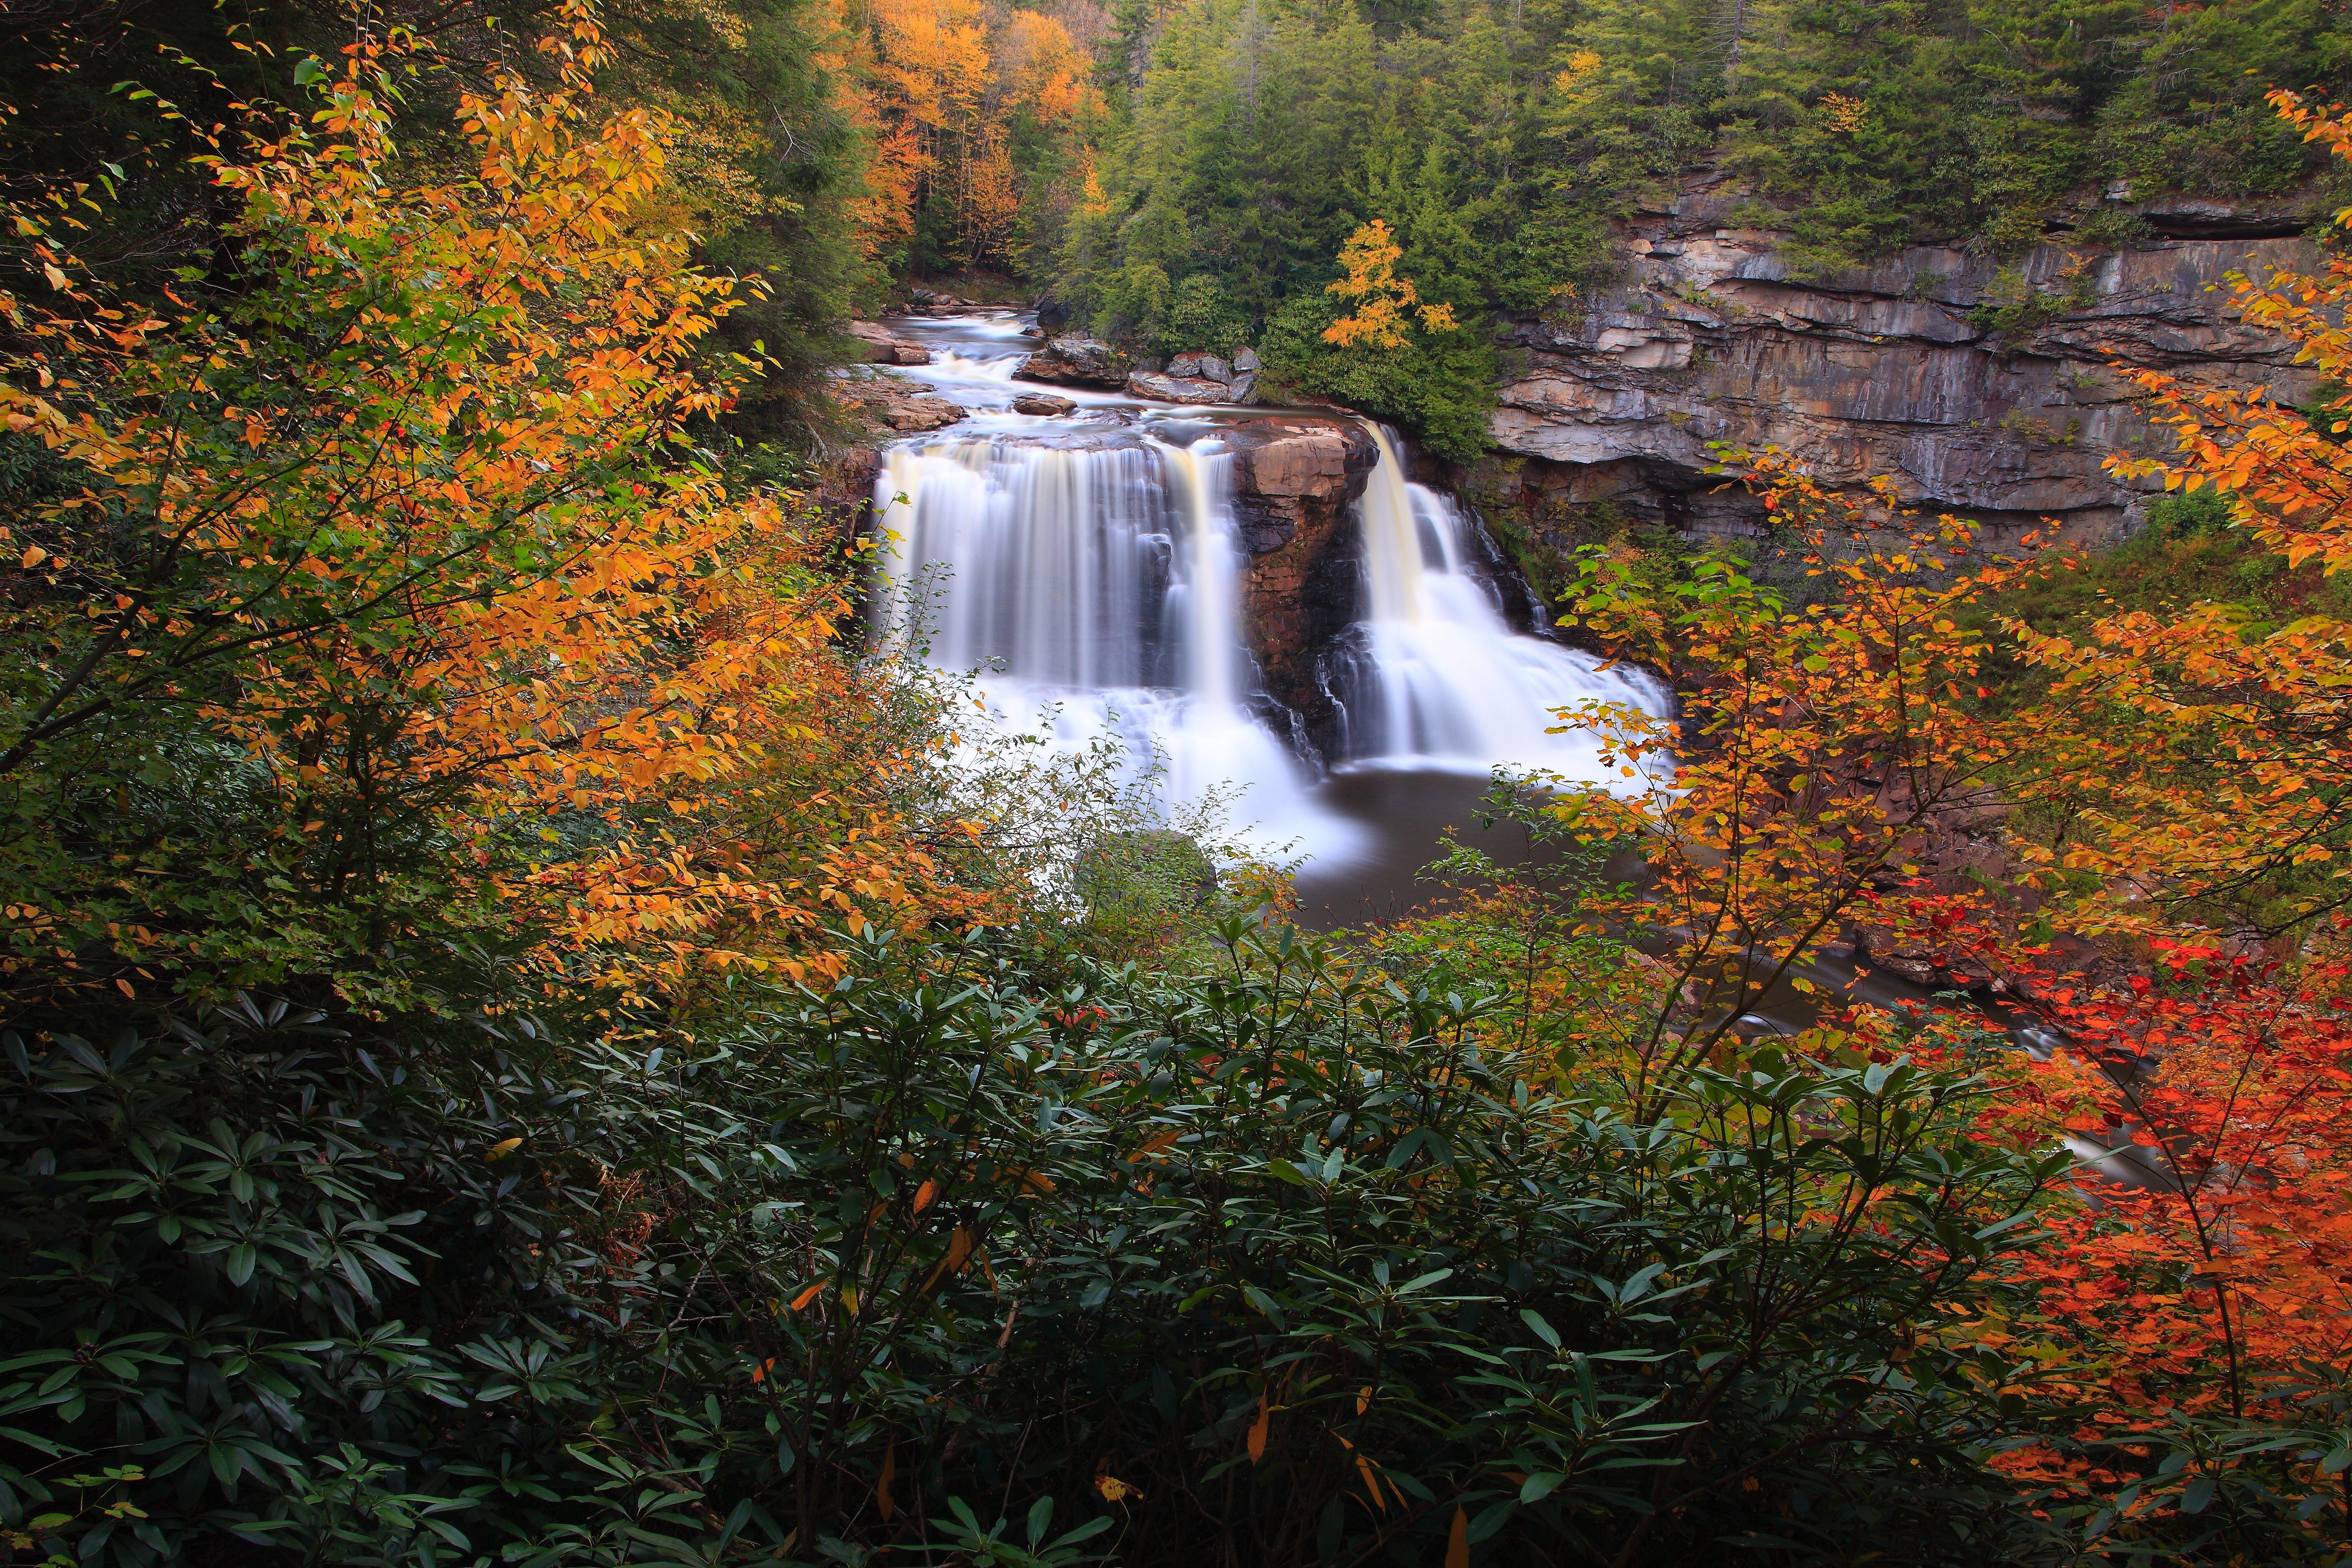 File Blackwater Falls Autumn Foliage Scenery West